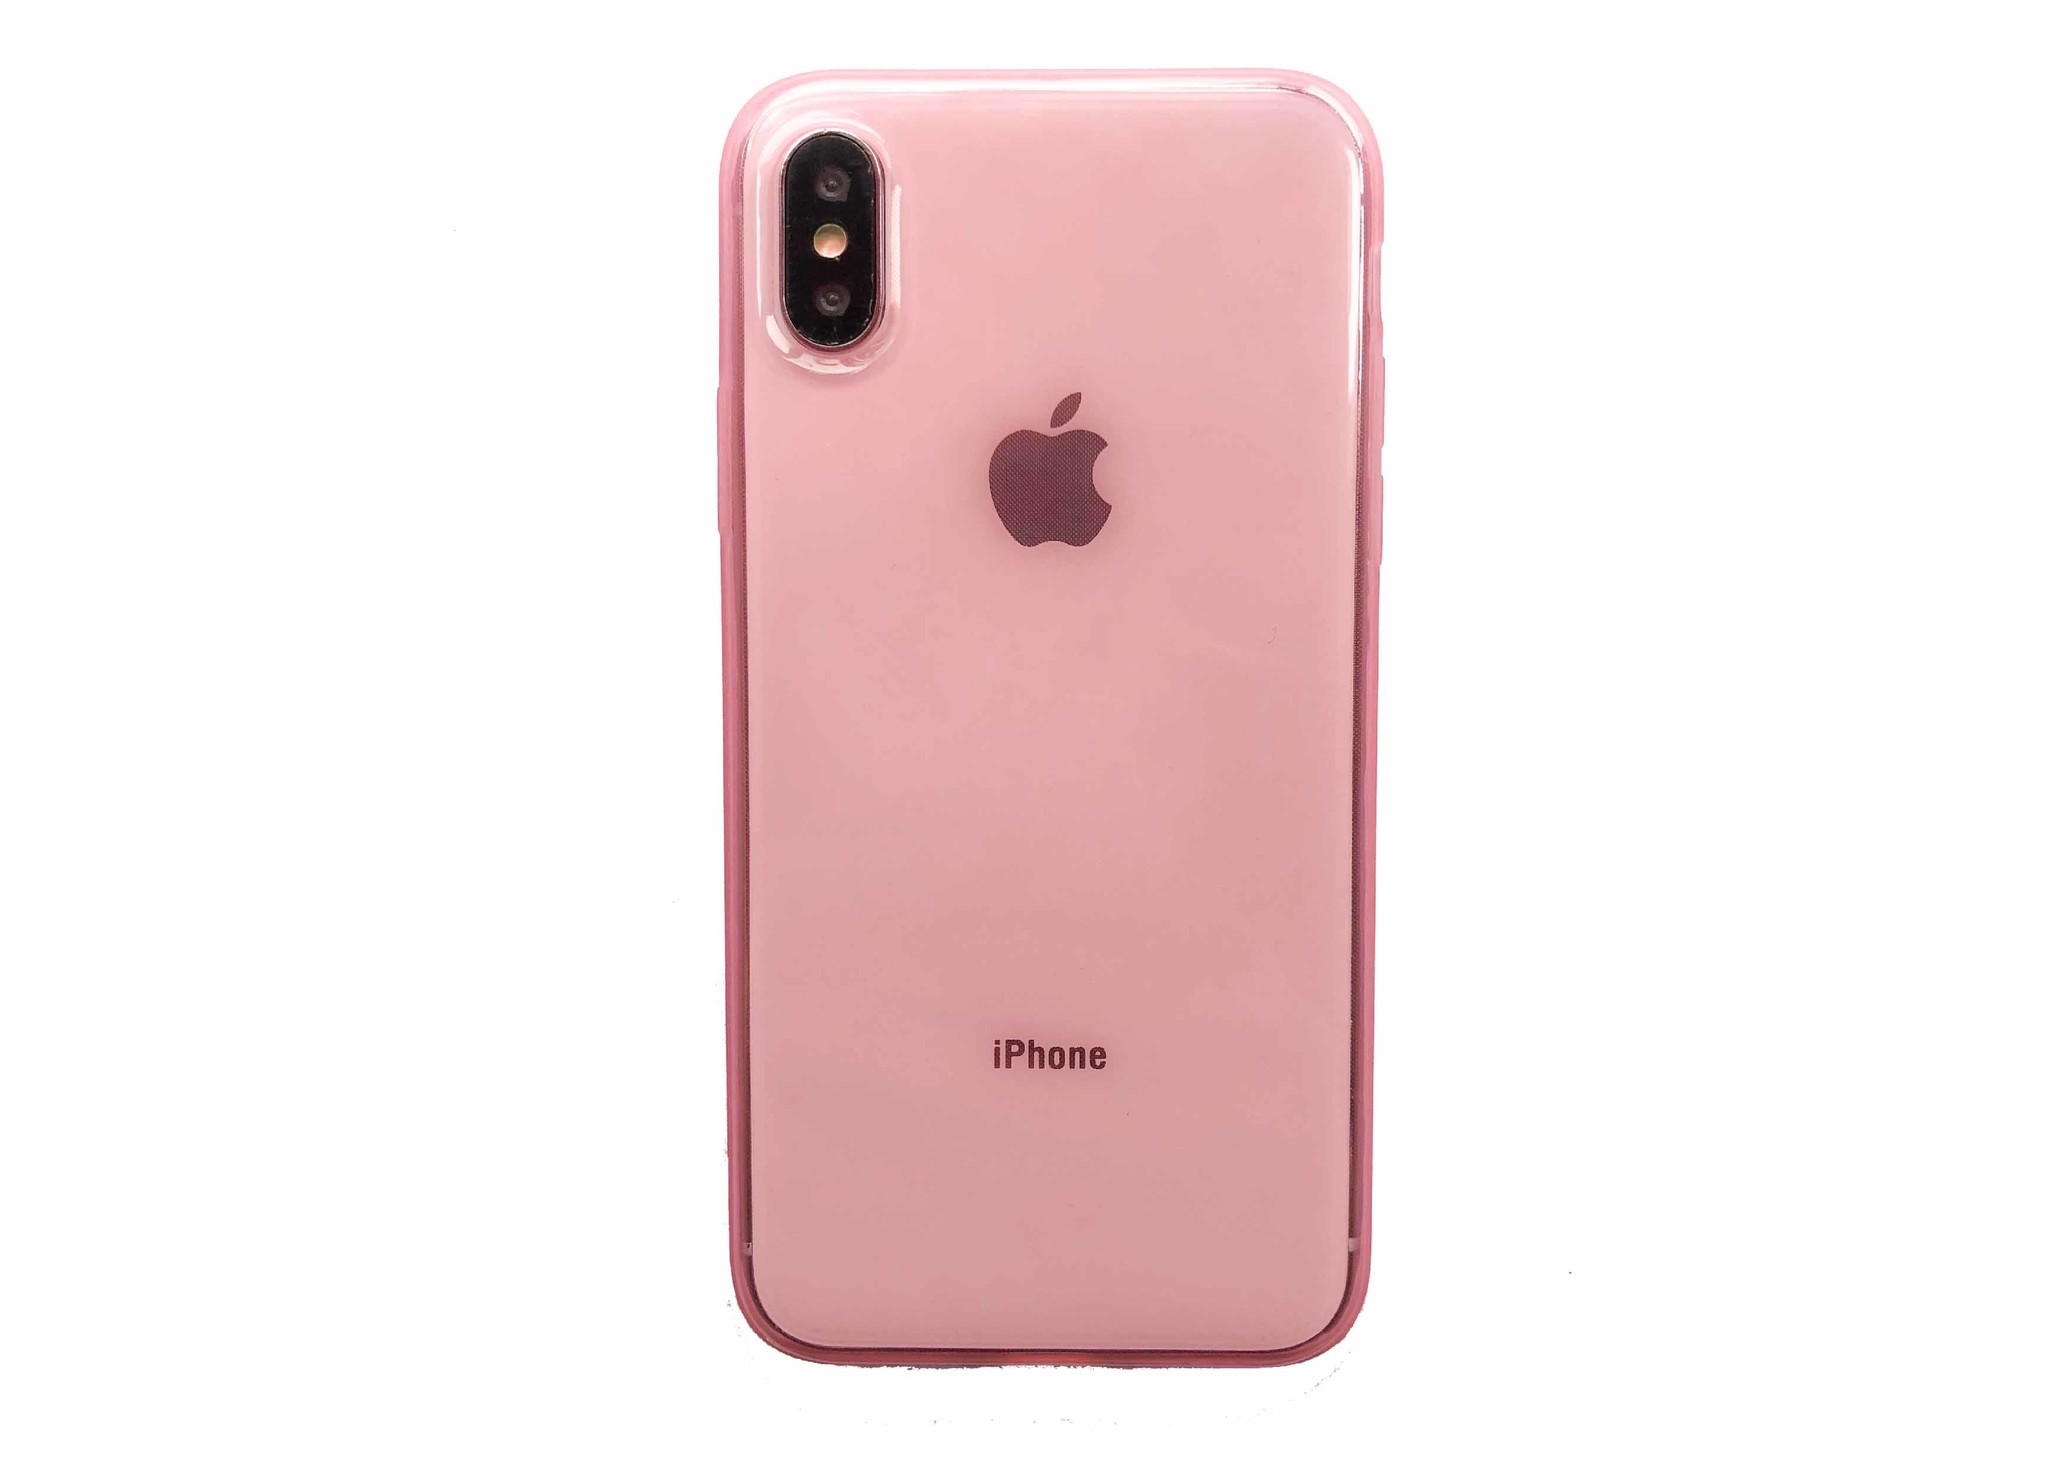 Smartphonehoesje iPhone 7 / 8 Plus | Roze / transparant